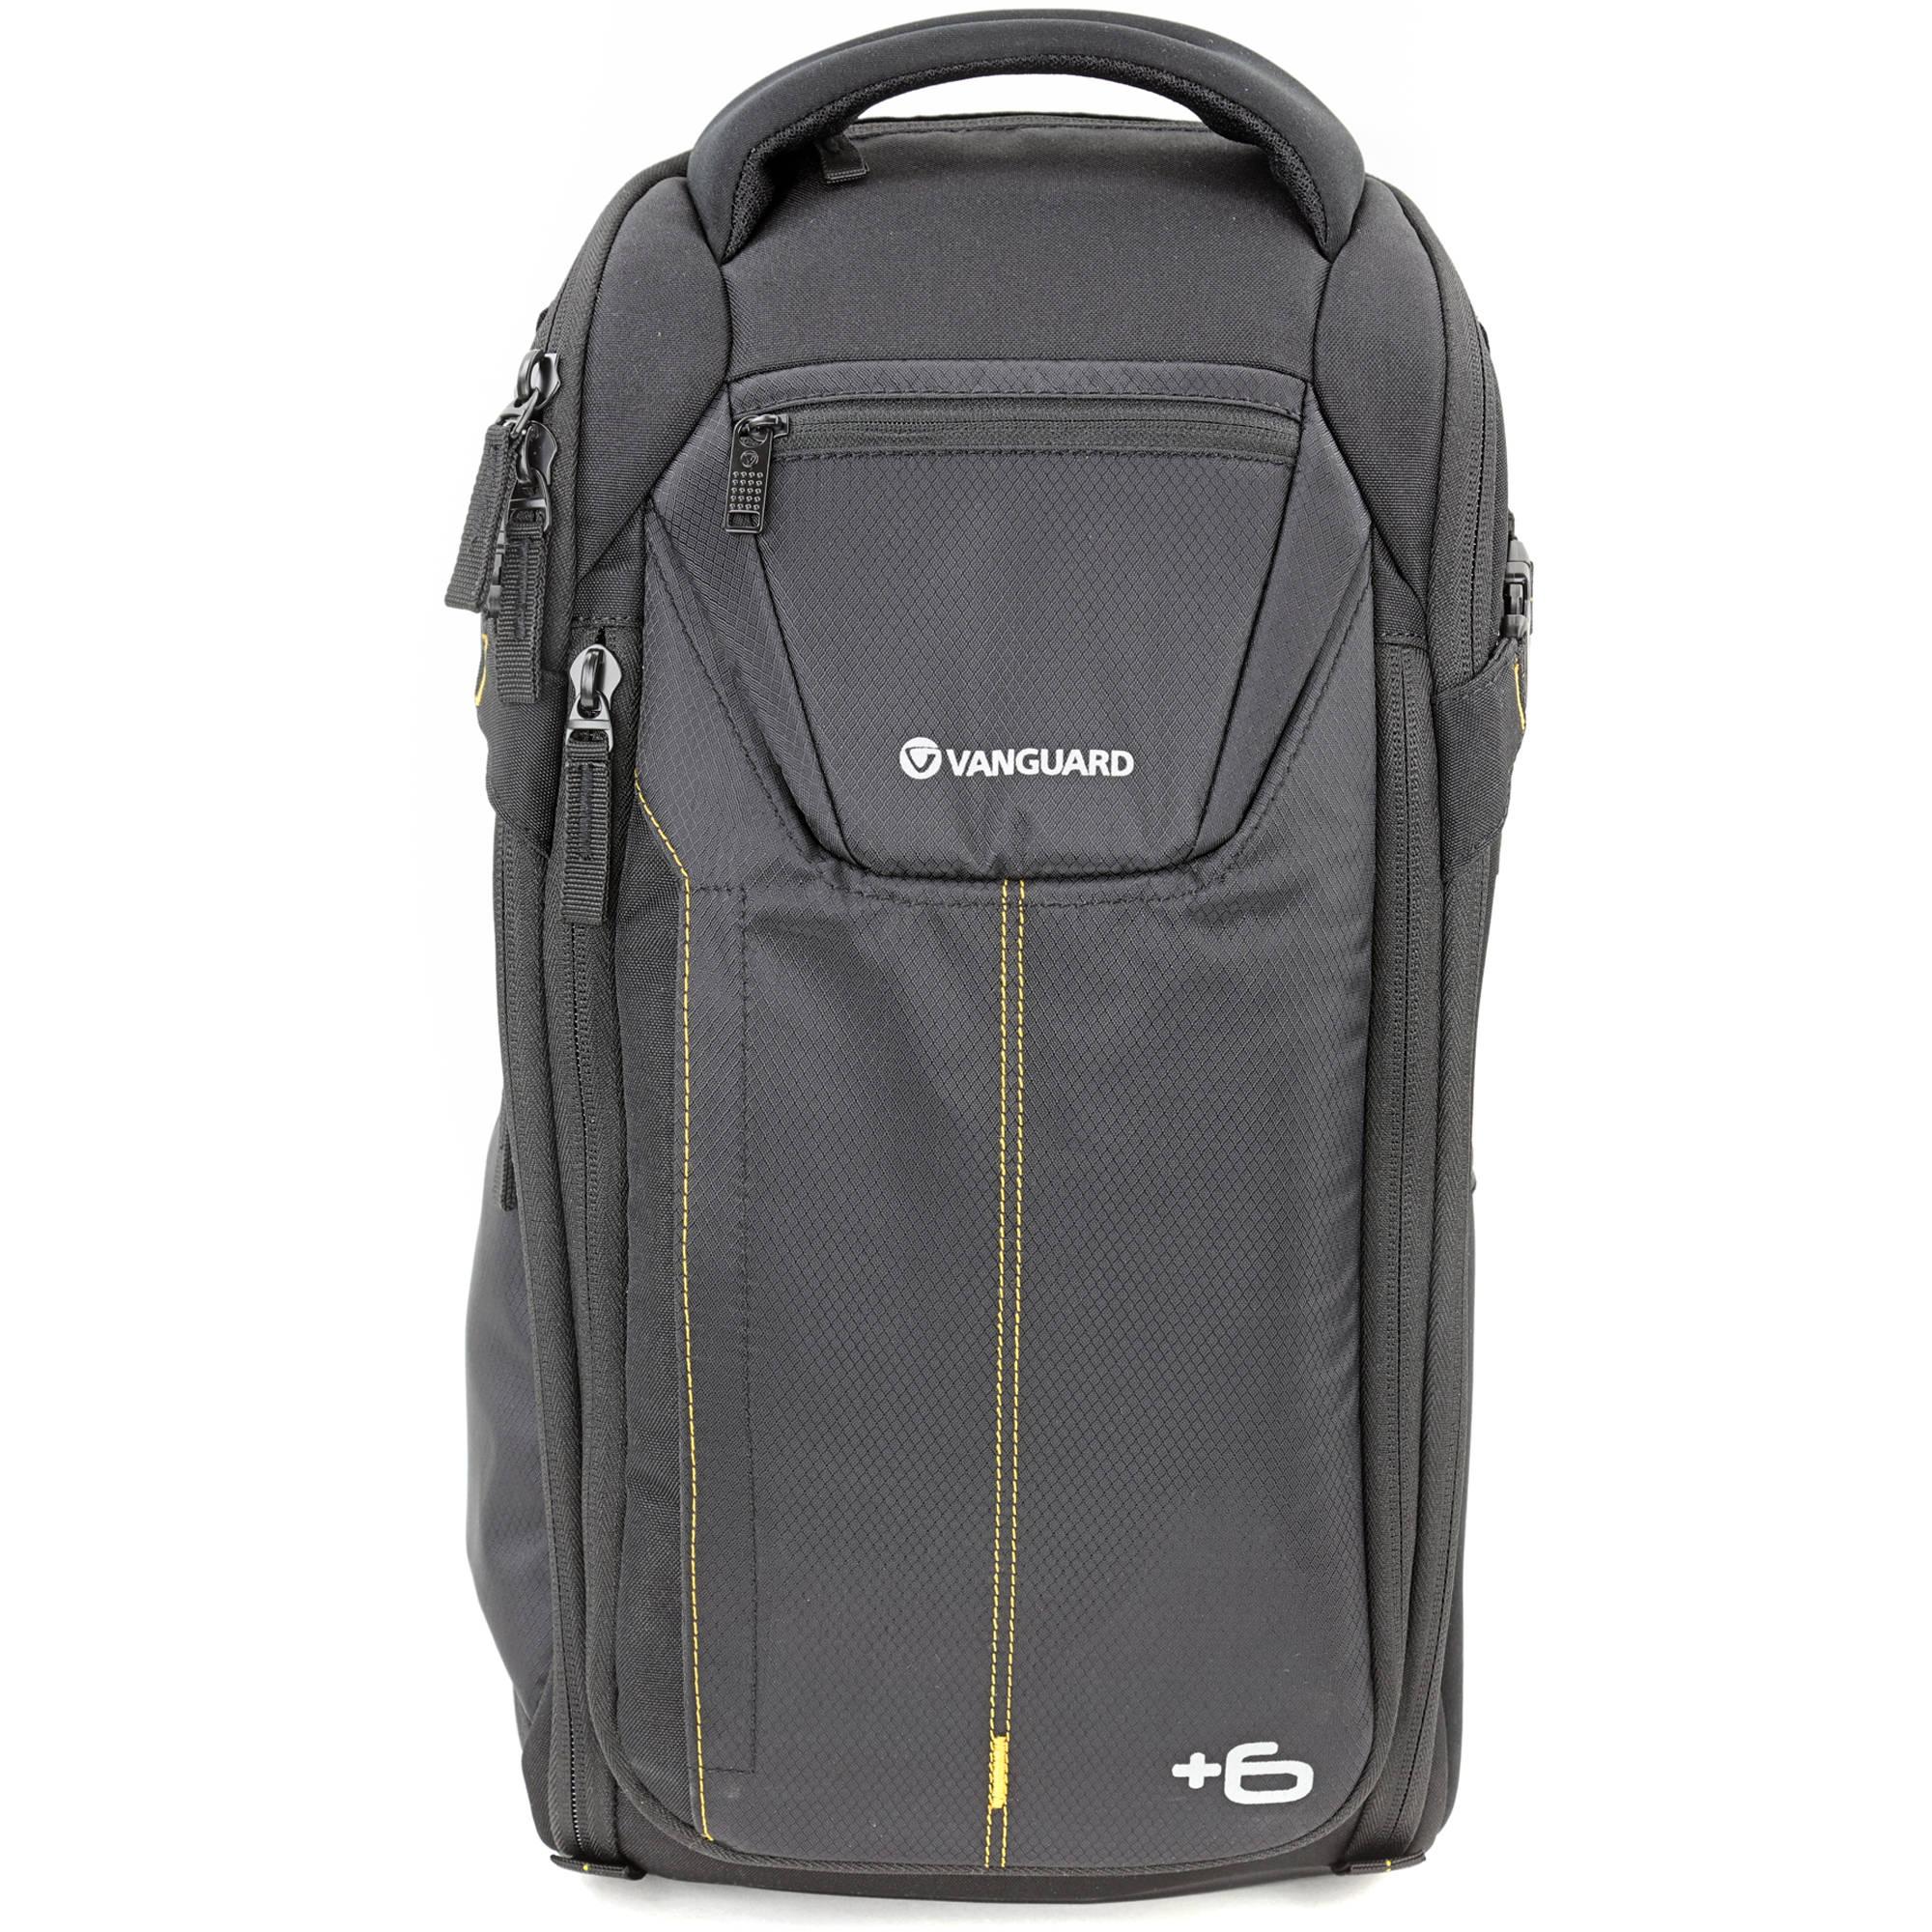 Vanguard The Alta Rise 43 Sling Bag Backpack Black